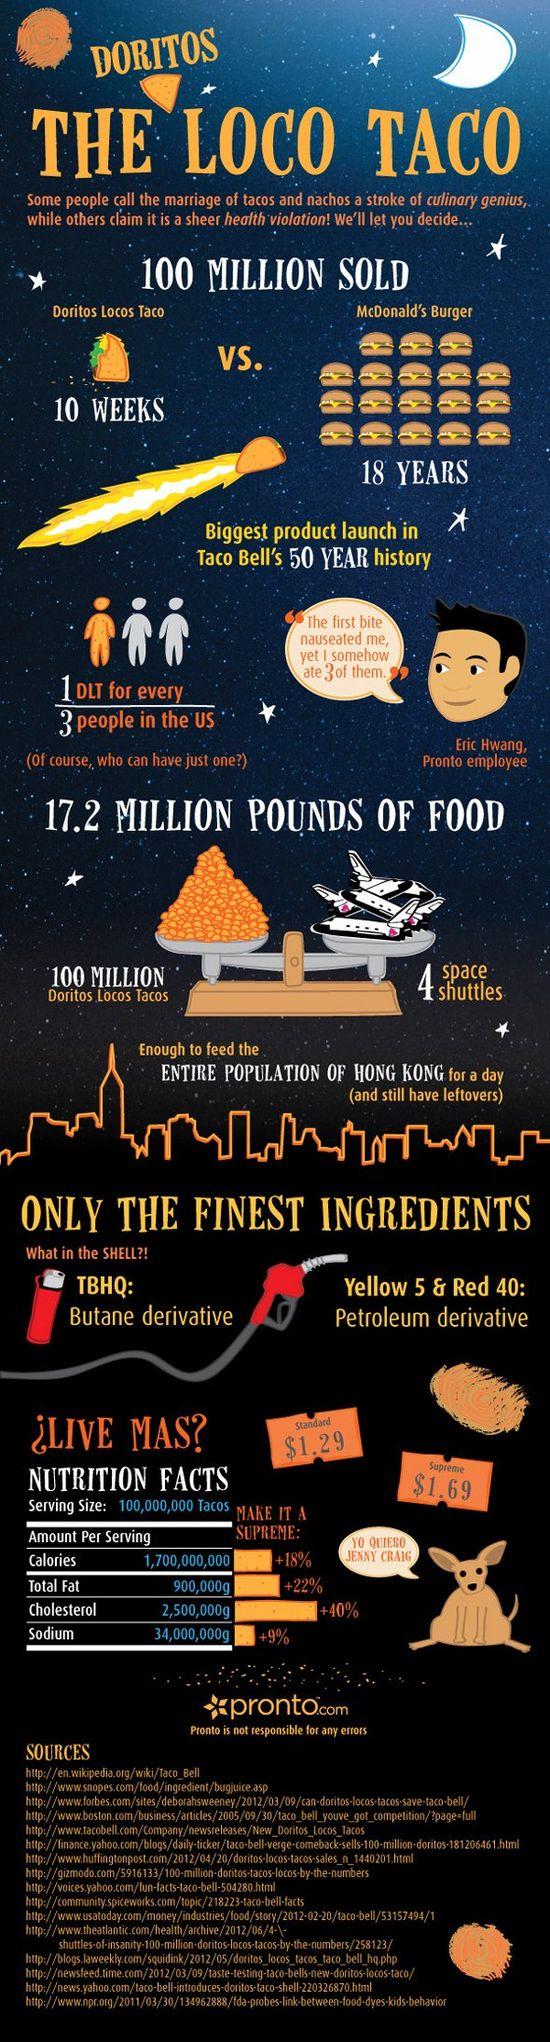 Taco Bell's Doritos Locos Taco Infographic